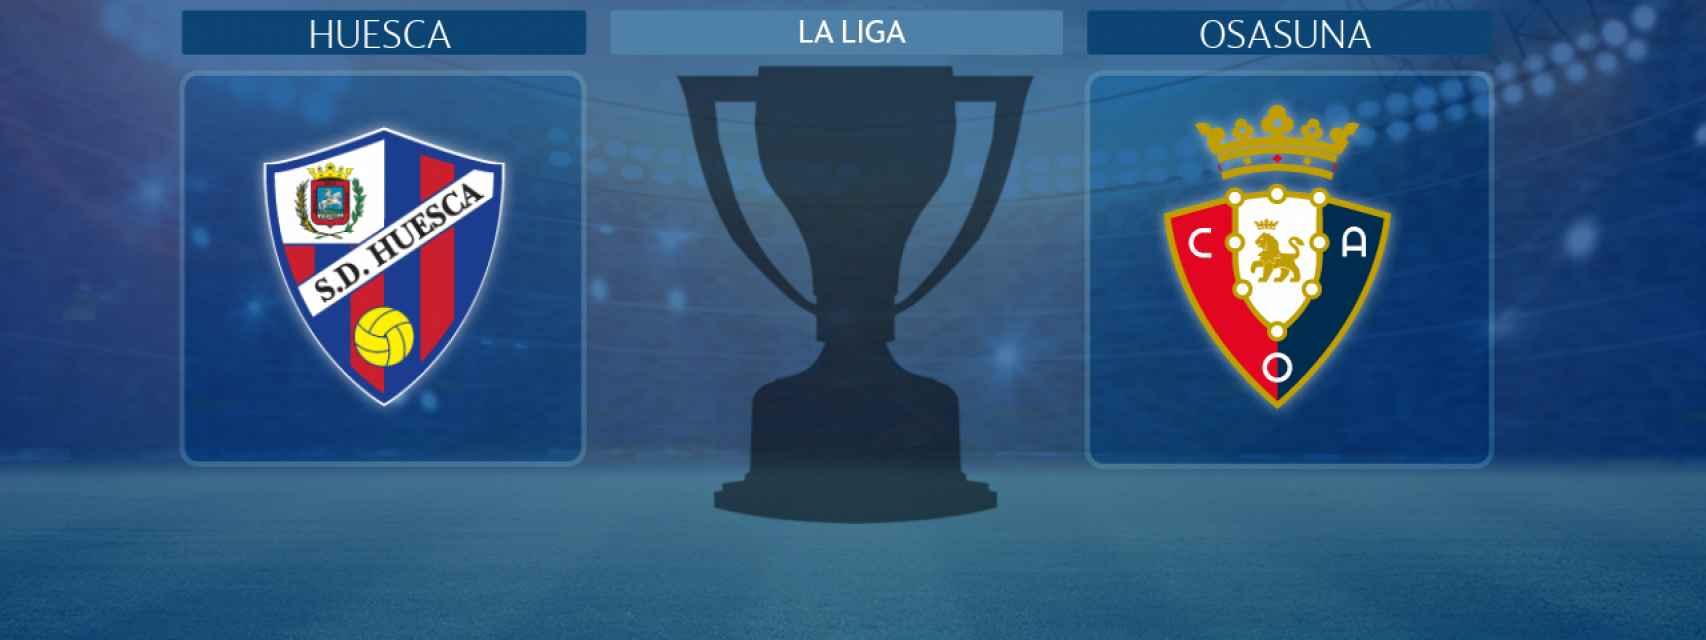 Huesca - Osasuna, partido de La Liga